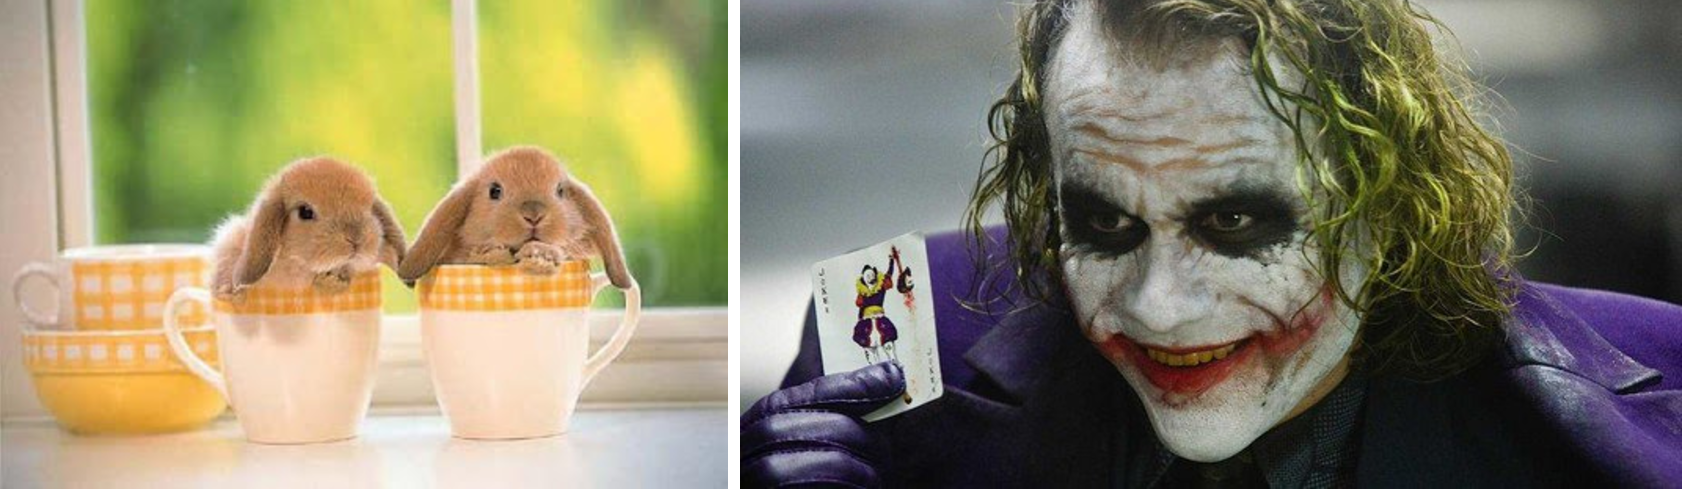 Bunny and Joker Animation Mentor